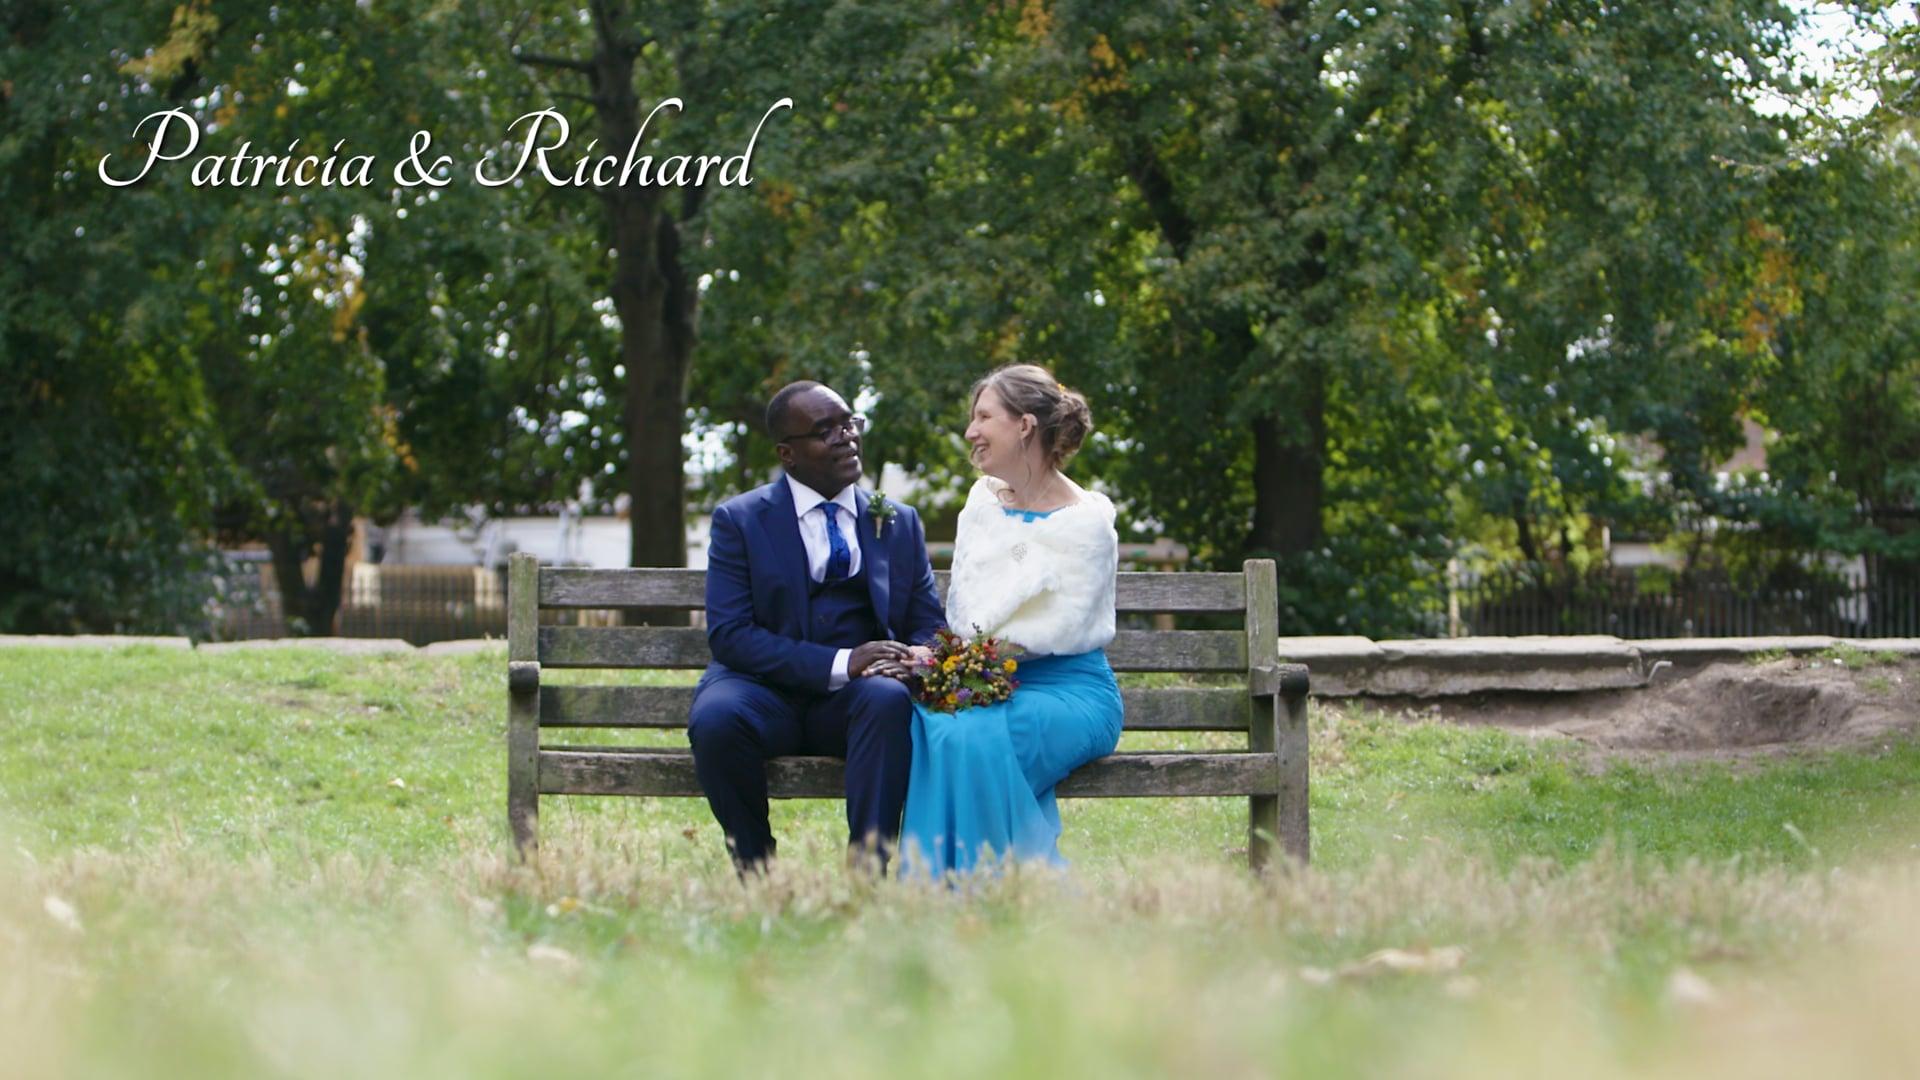 Patricia & Richard - Wedding Highlights (Event)